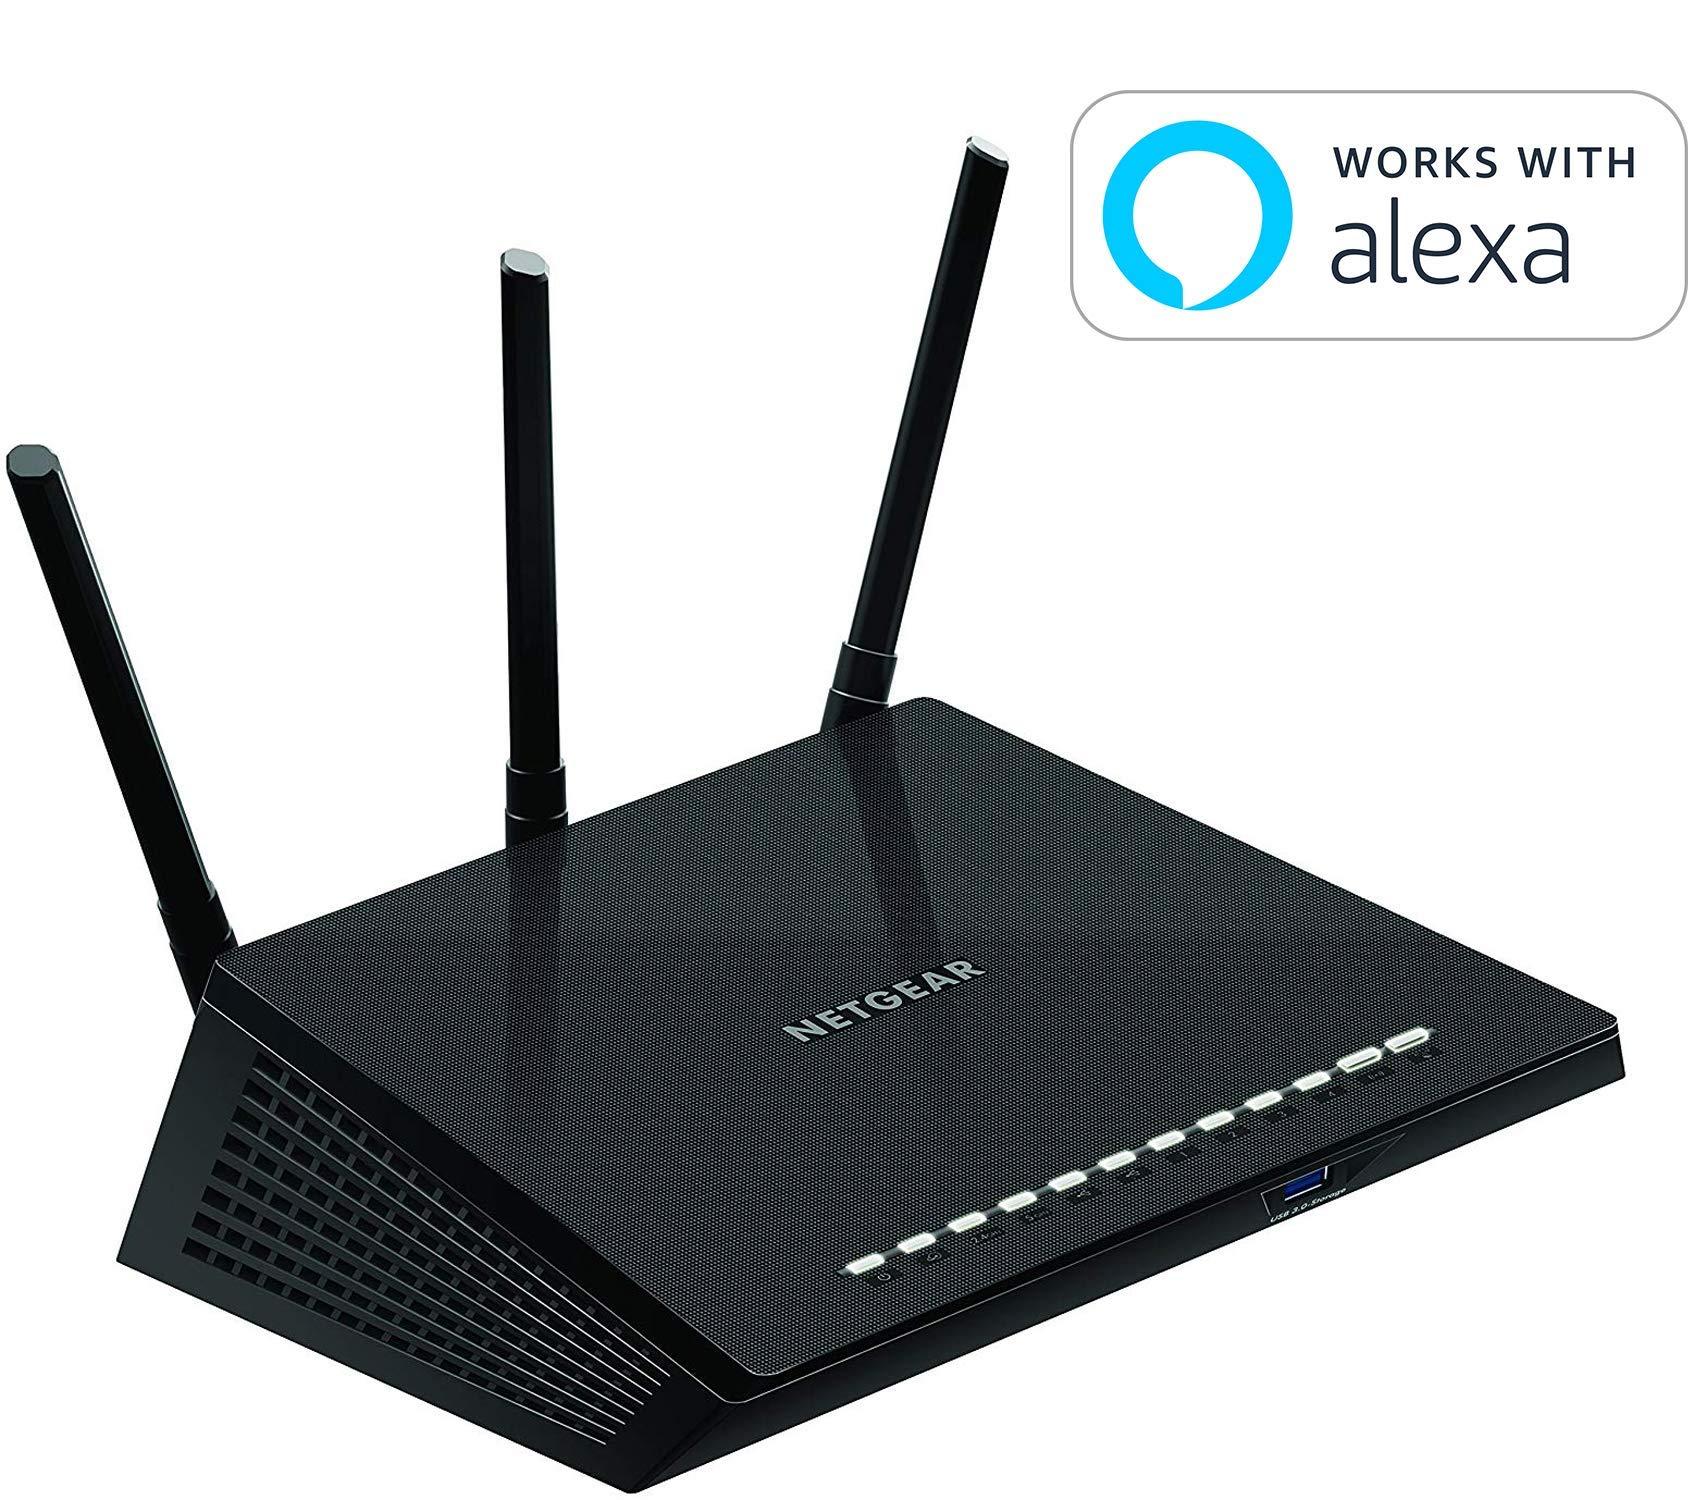 NETGEAR Smart WiFi Router with Dual Band Gigabit for Amazon Echo/Alexa - AC1750 (R6400-100NAS) by NETGEAR